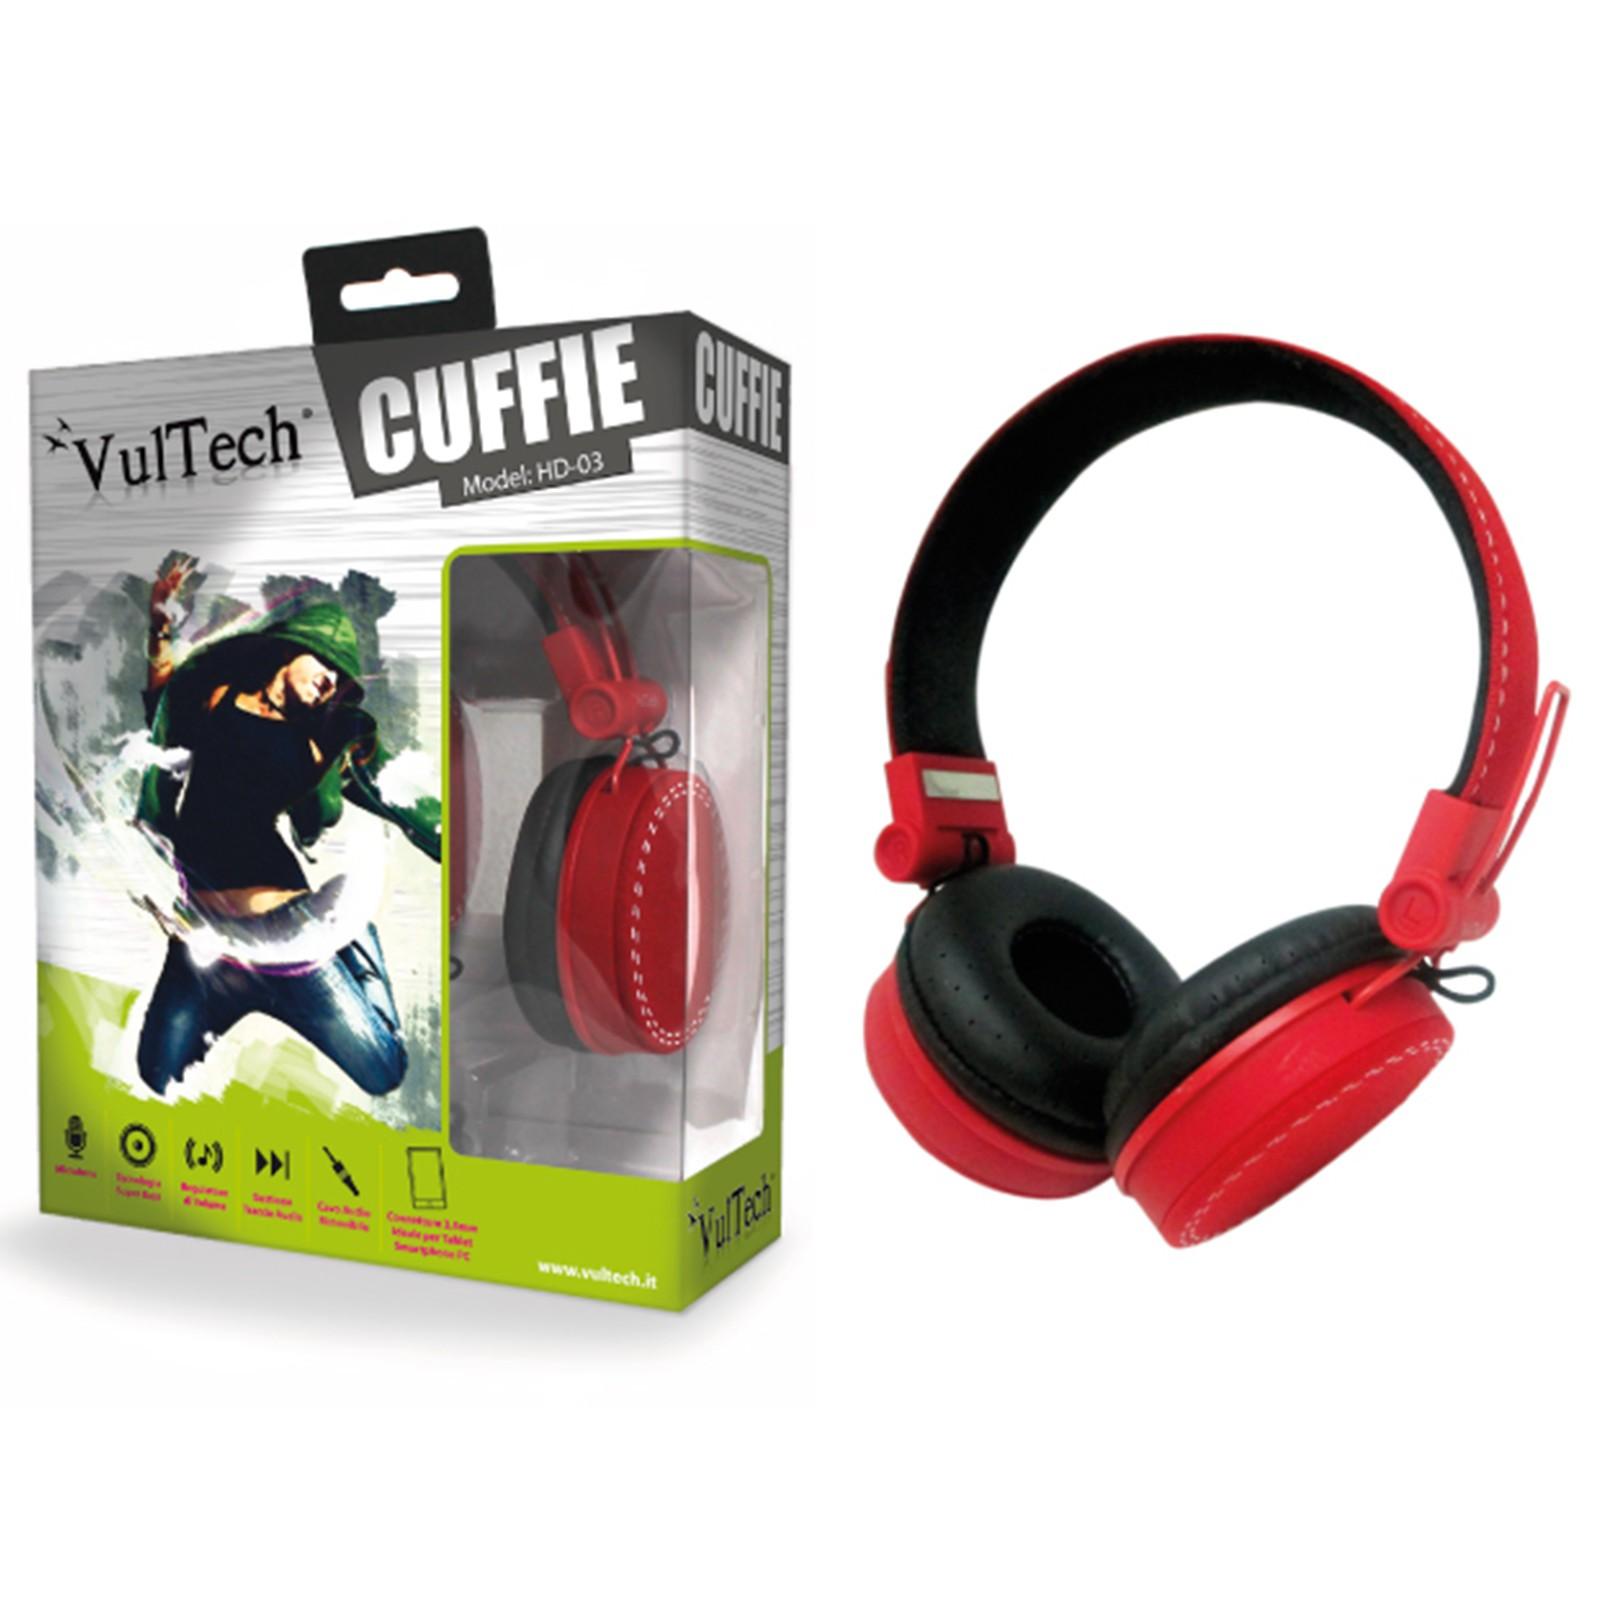 CUFFIE IPOD IPHONE HEADPHONES PER STEREO PC MUSICA MP3 GAME CD DVD ROSSE VULTECH